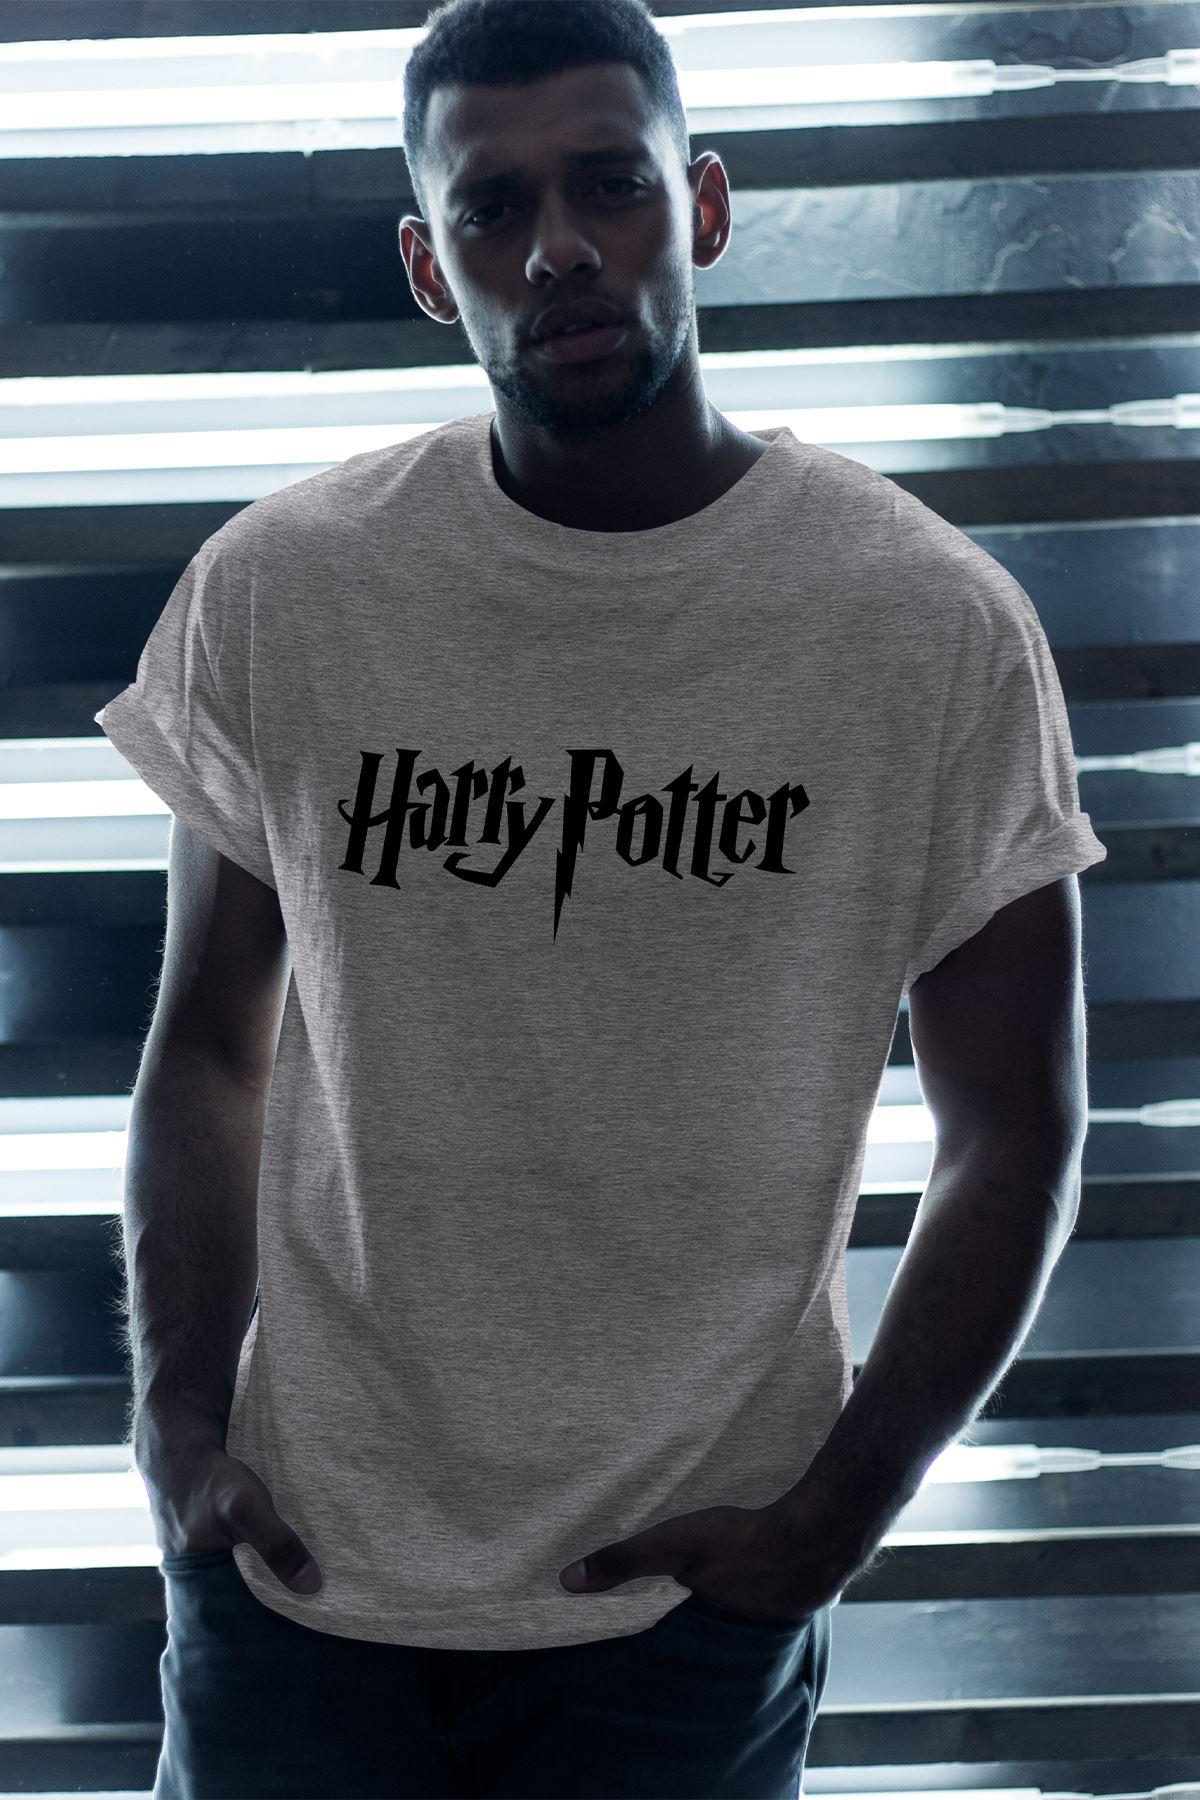 Harry Potter Gri Erkek Oversize Tshirt - Tişört